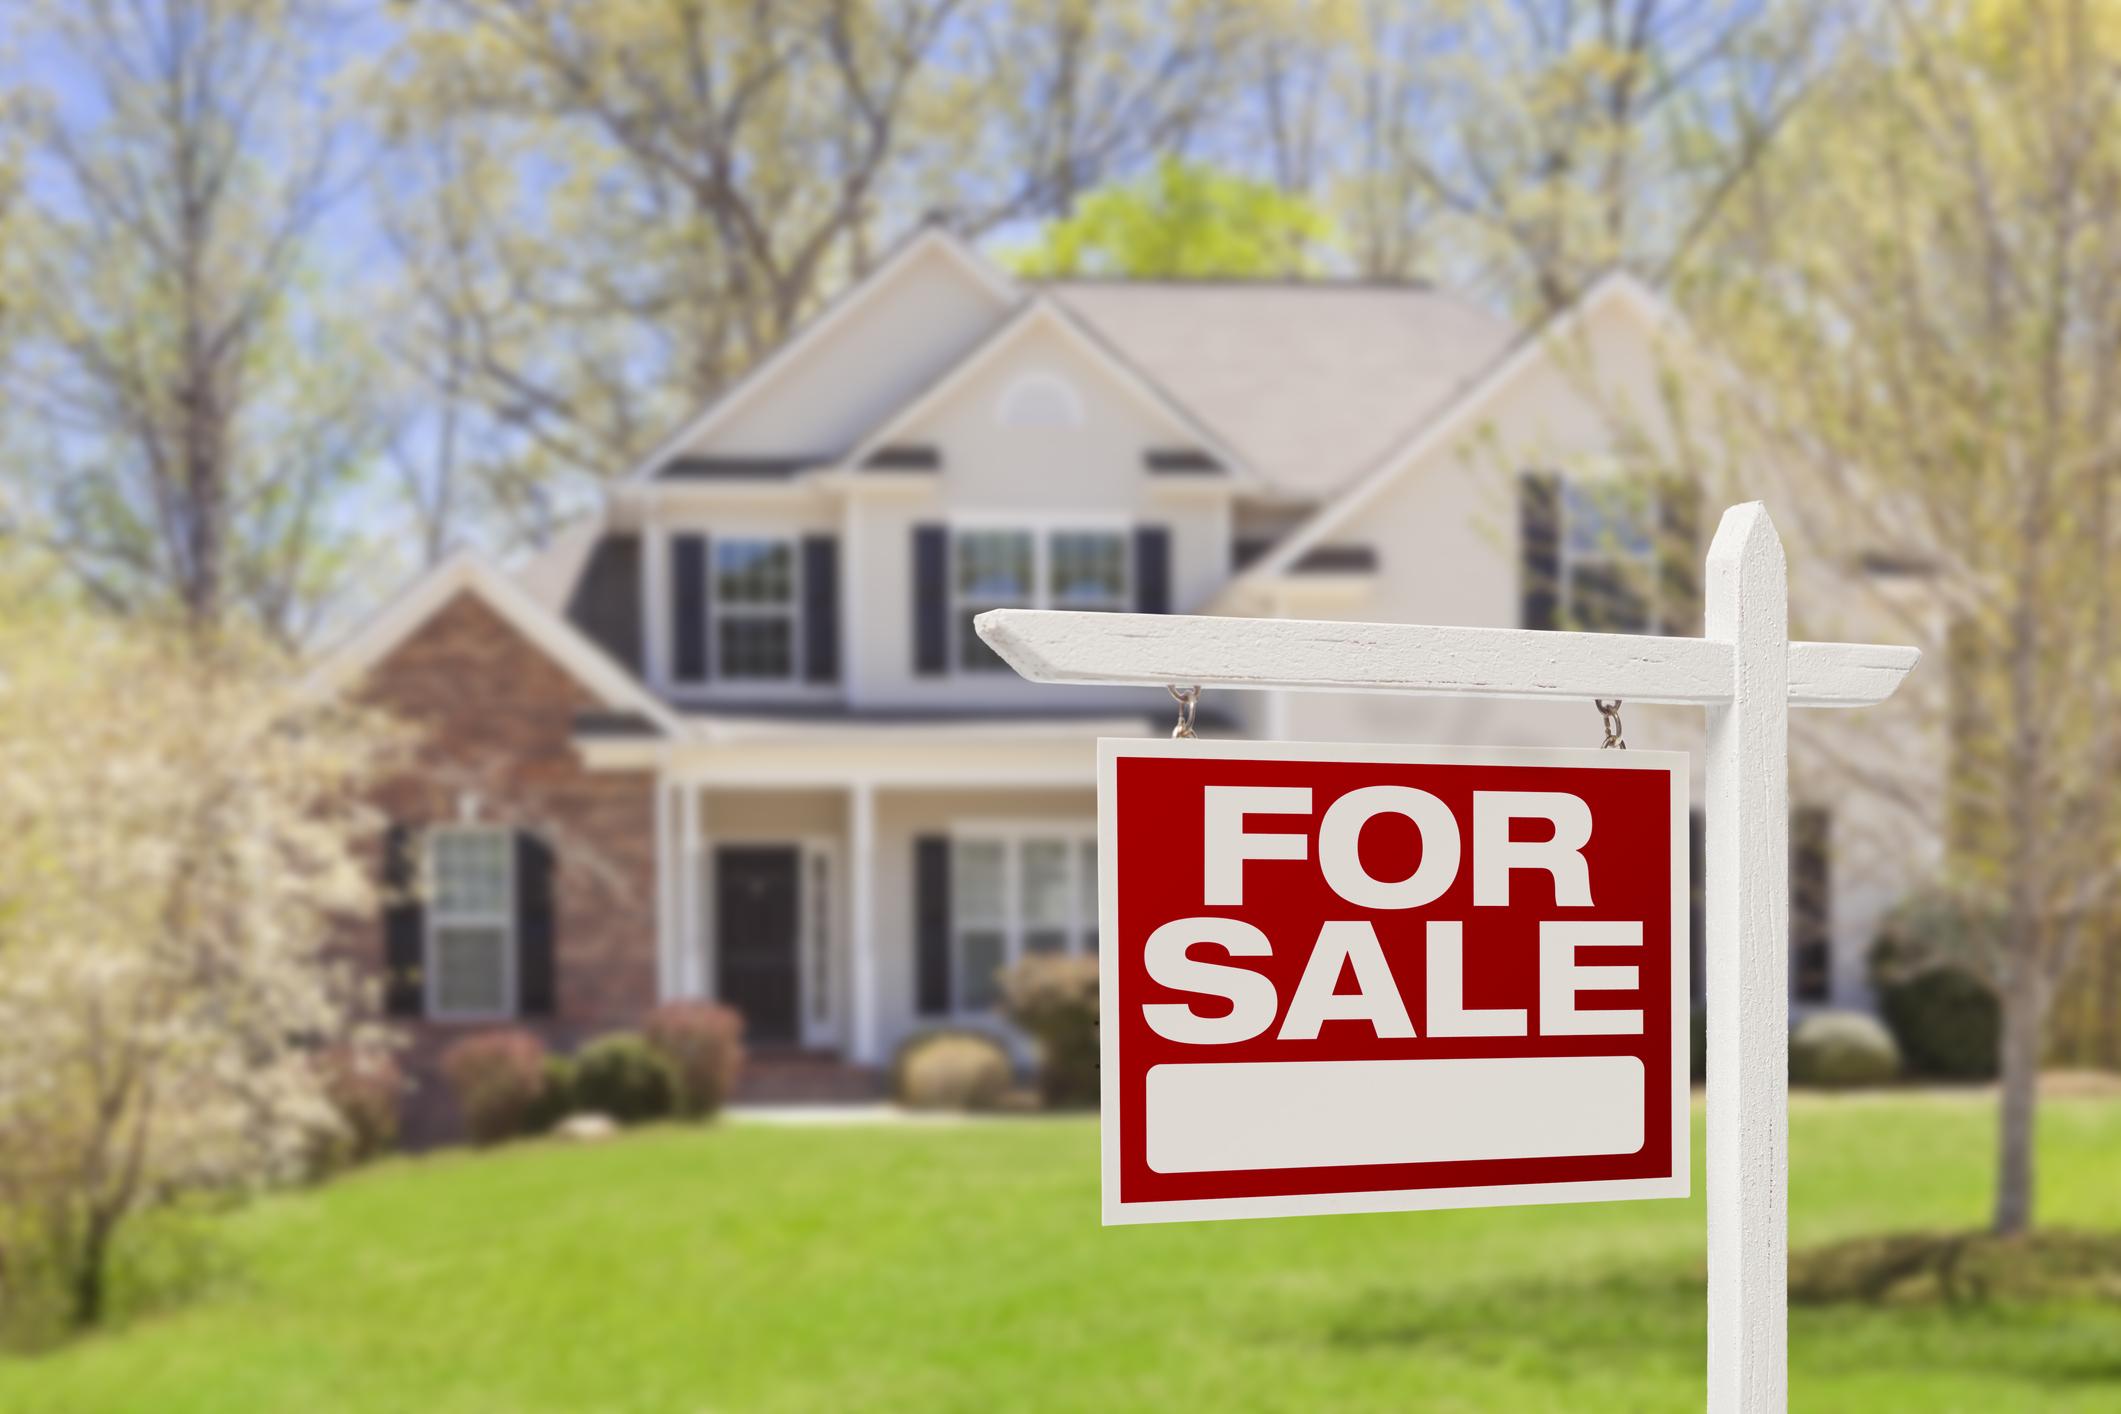 Sale of a business or real estate El Segundo, CA California Retirement Advisors